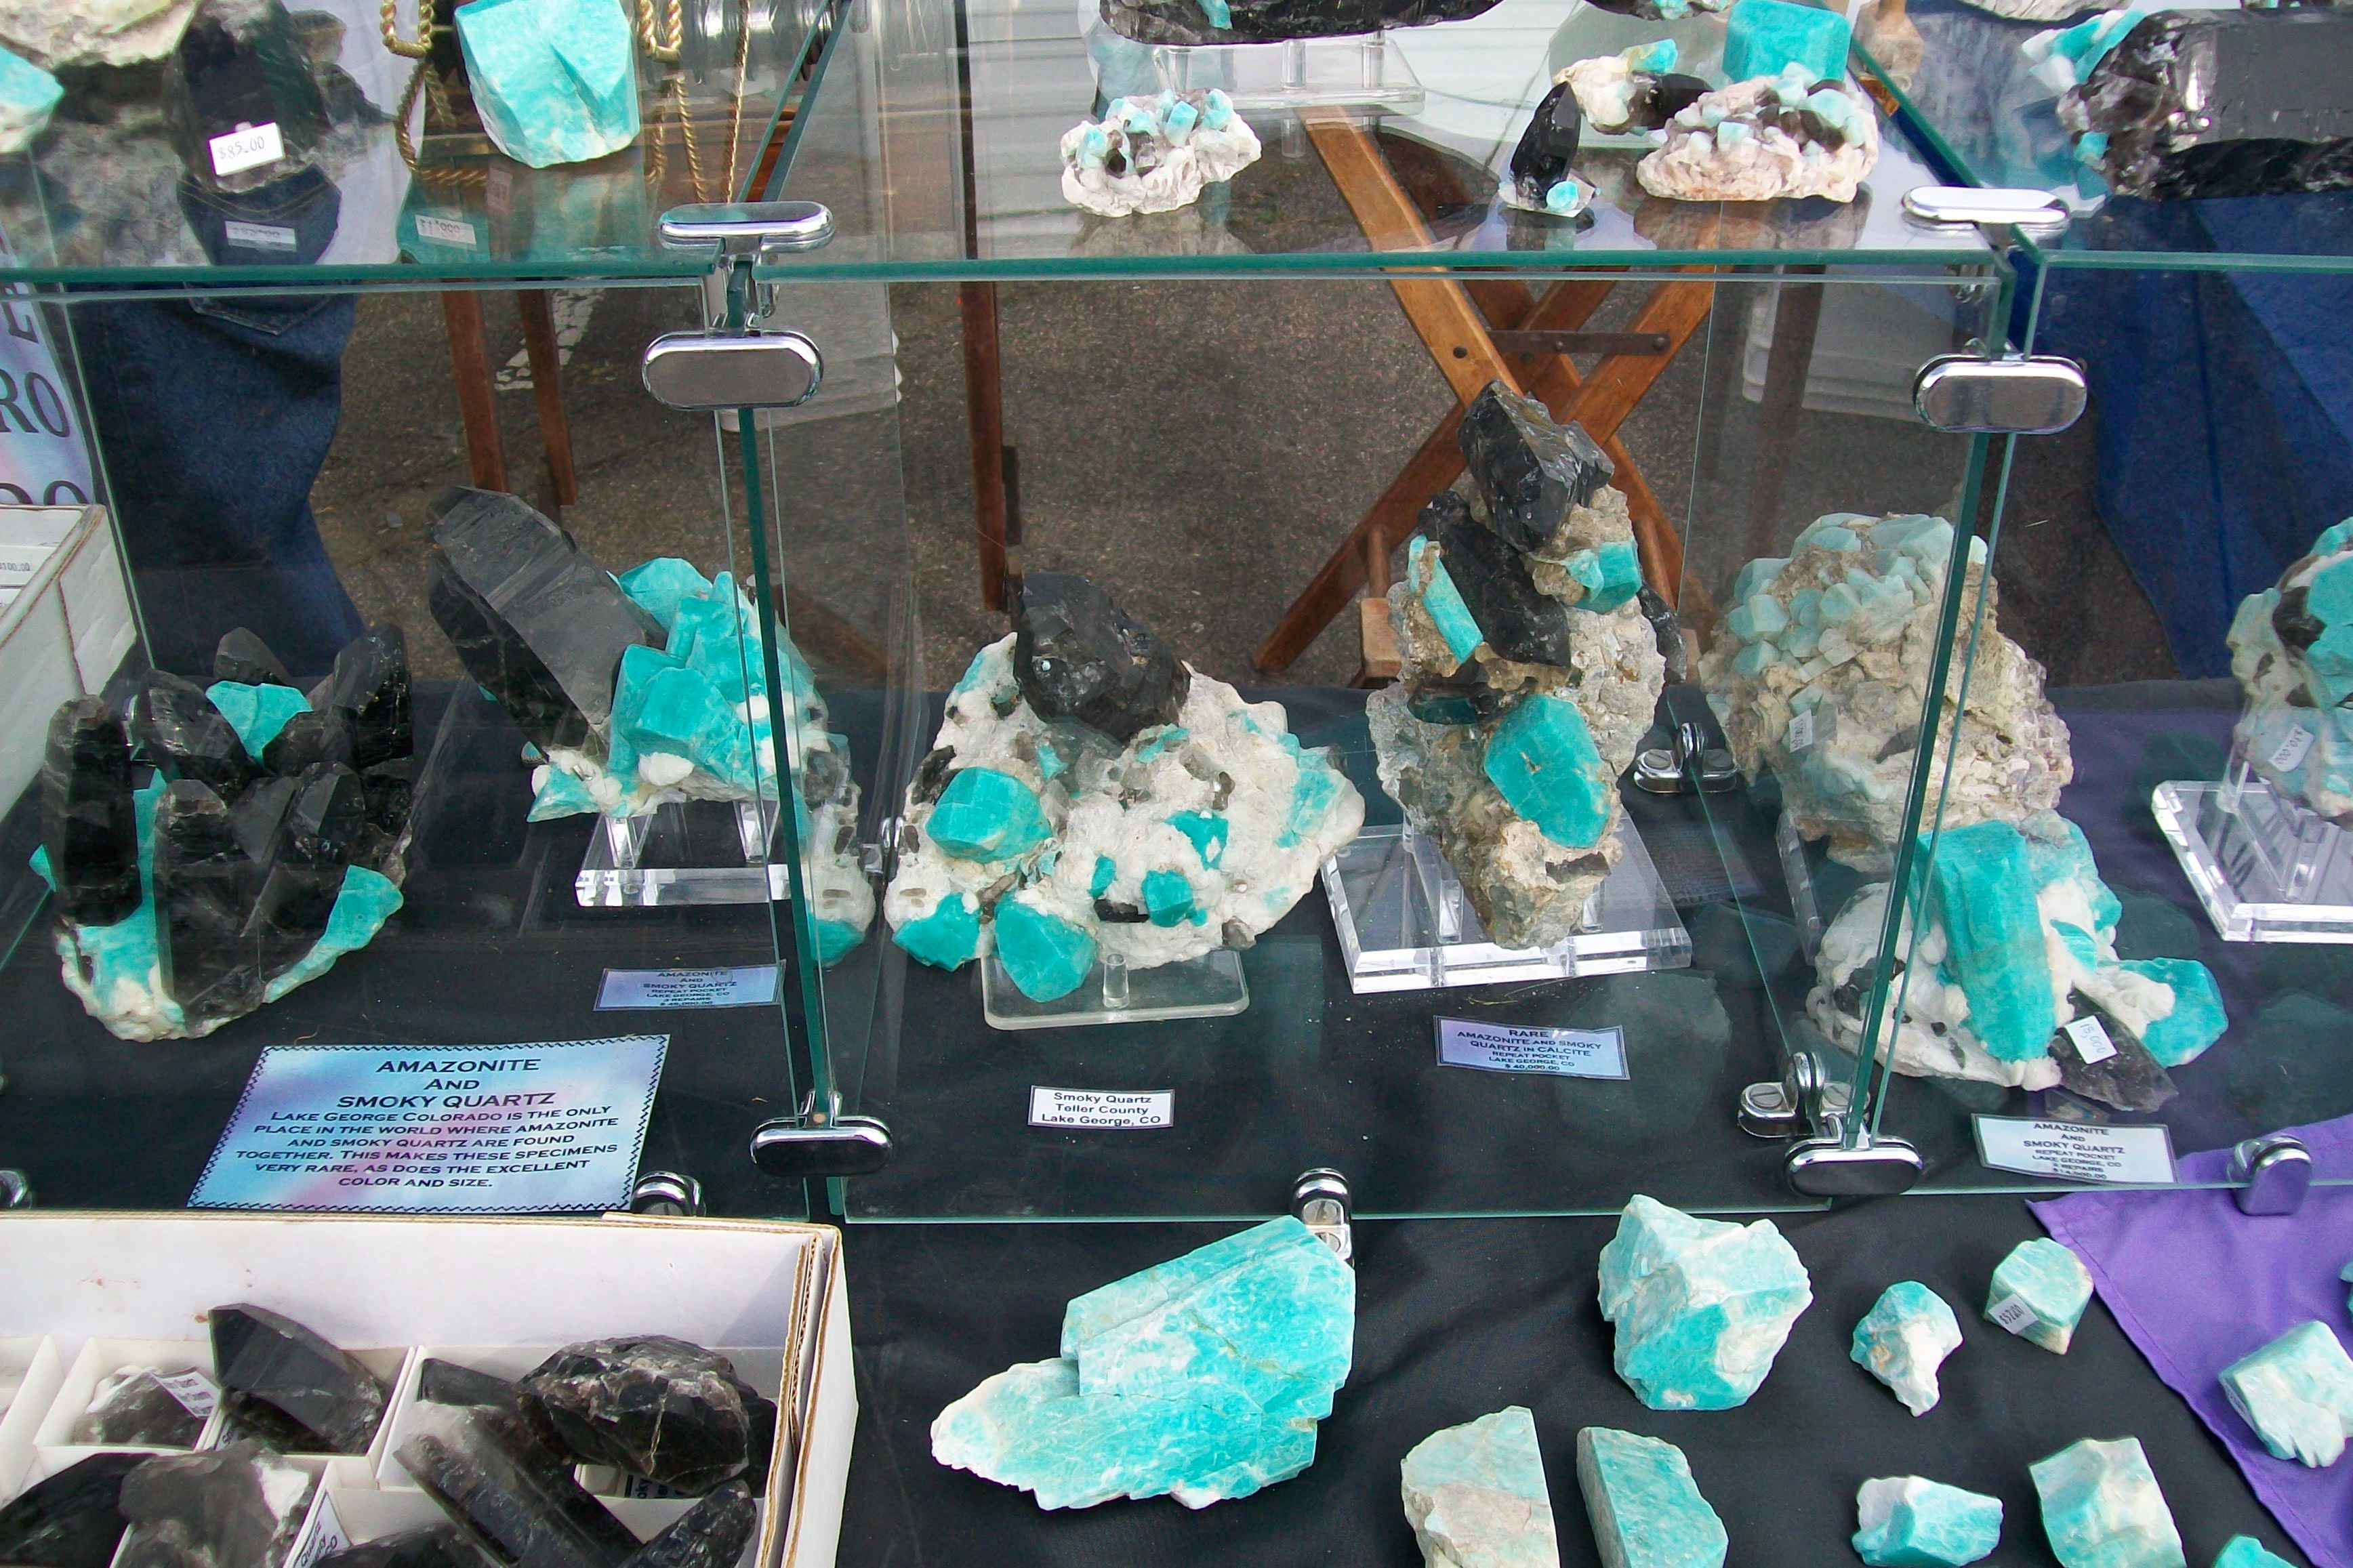 Denver gem and mineral show handcrafted jewelry by for Denver gem and jewelry show 2018